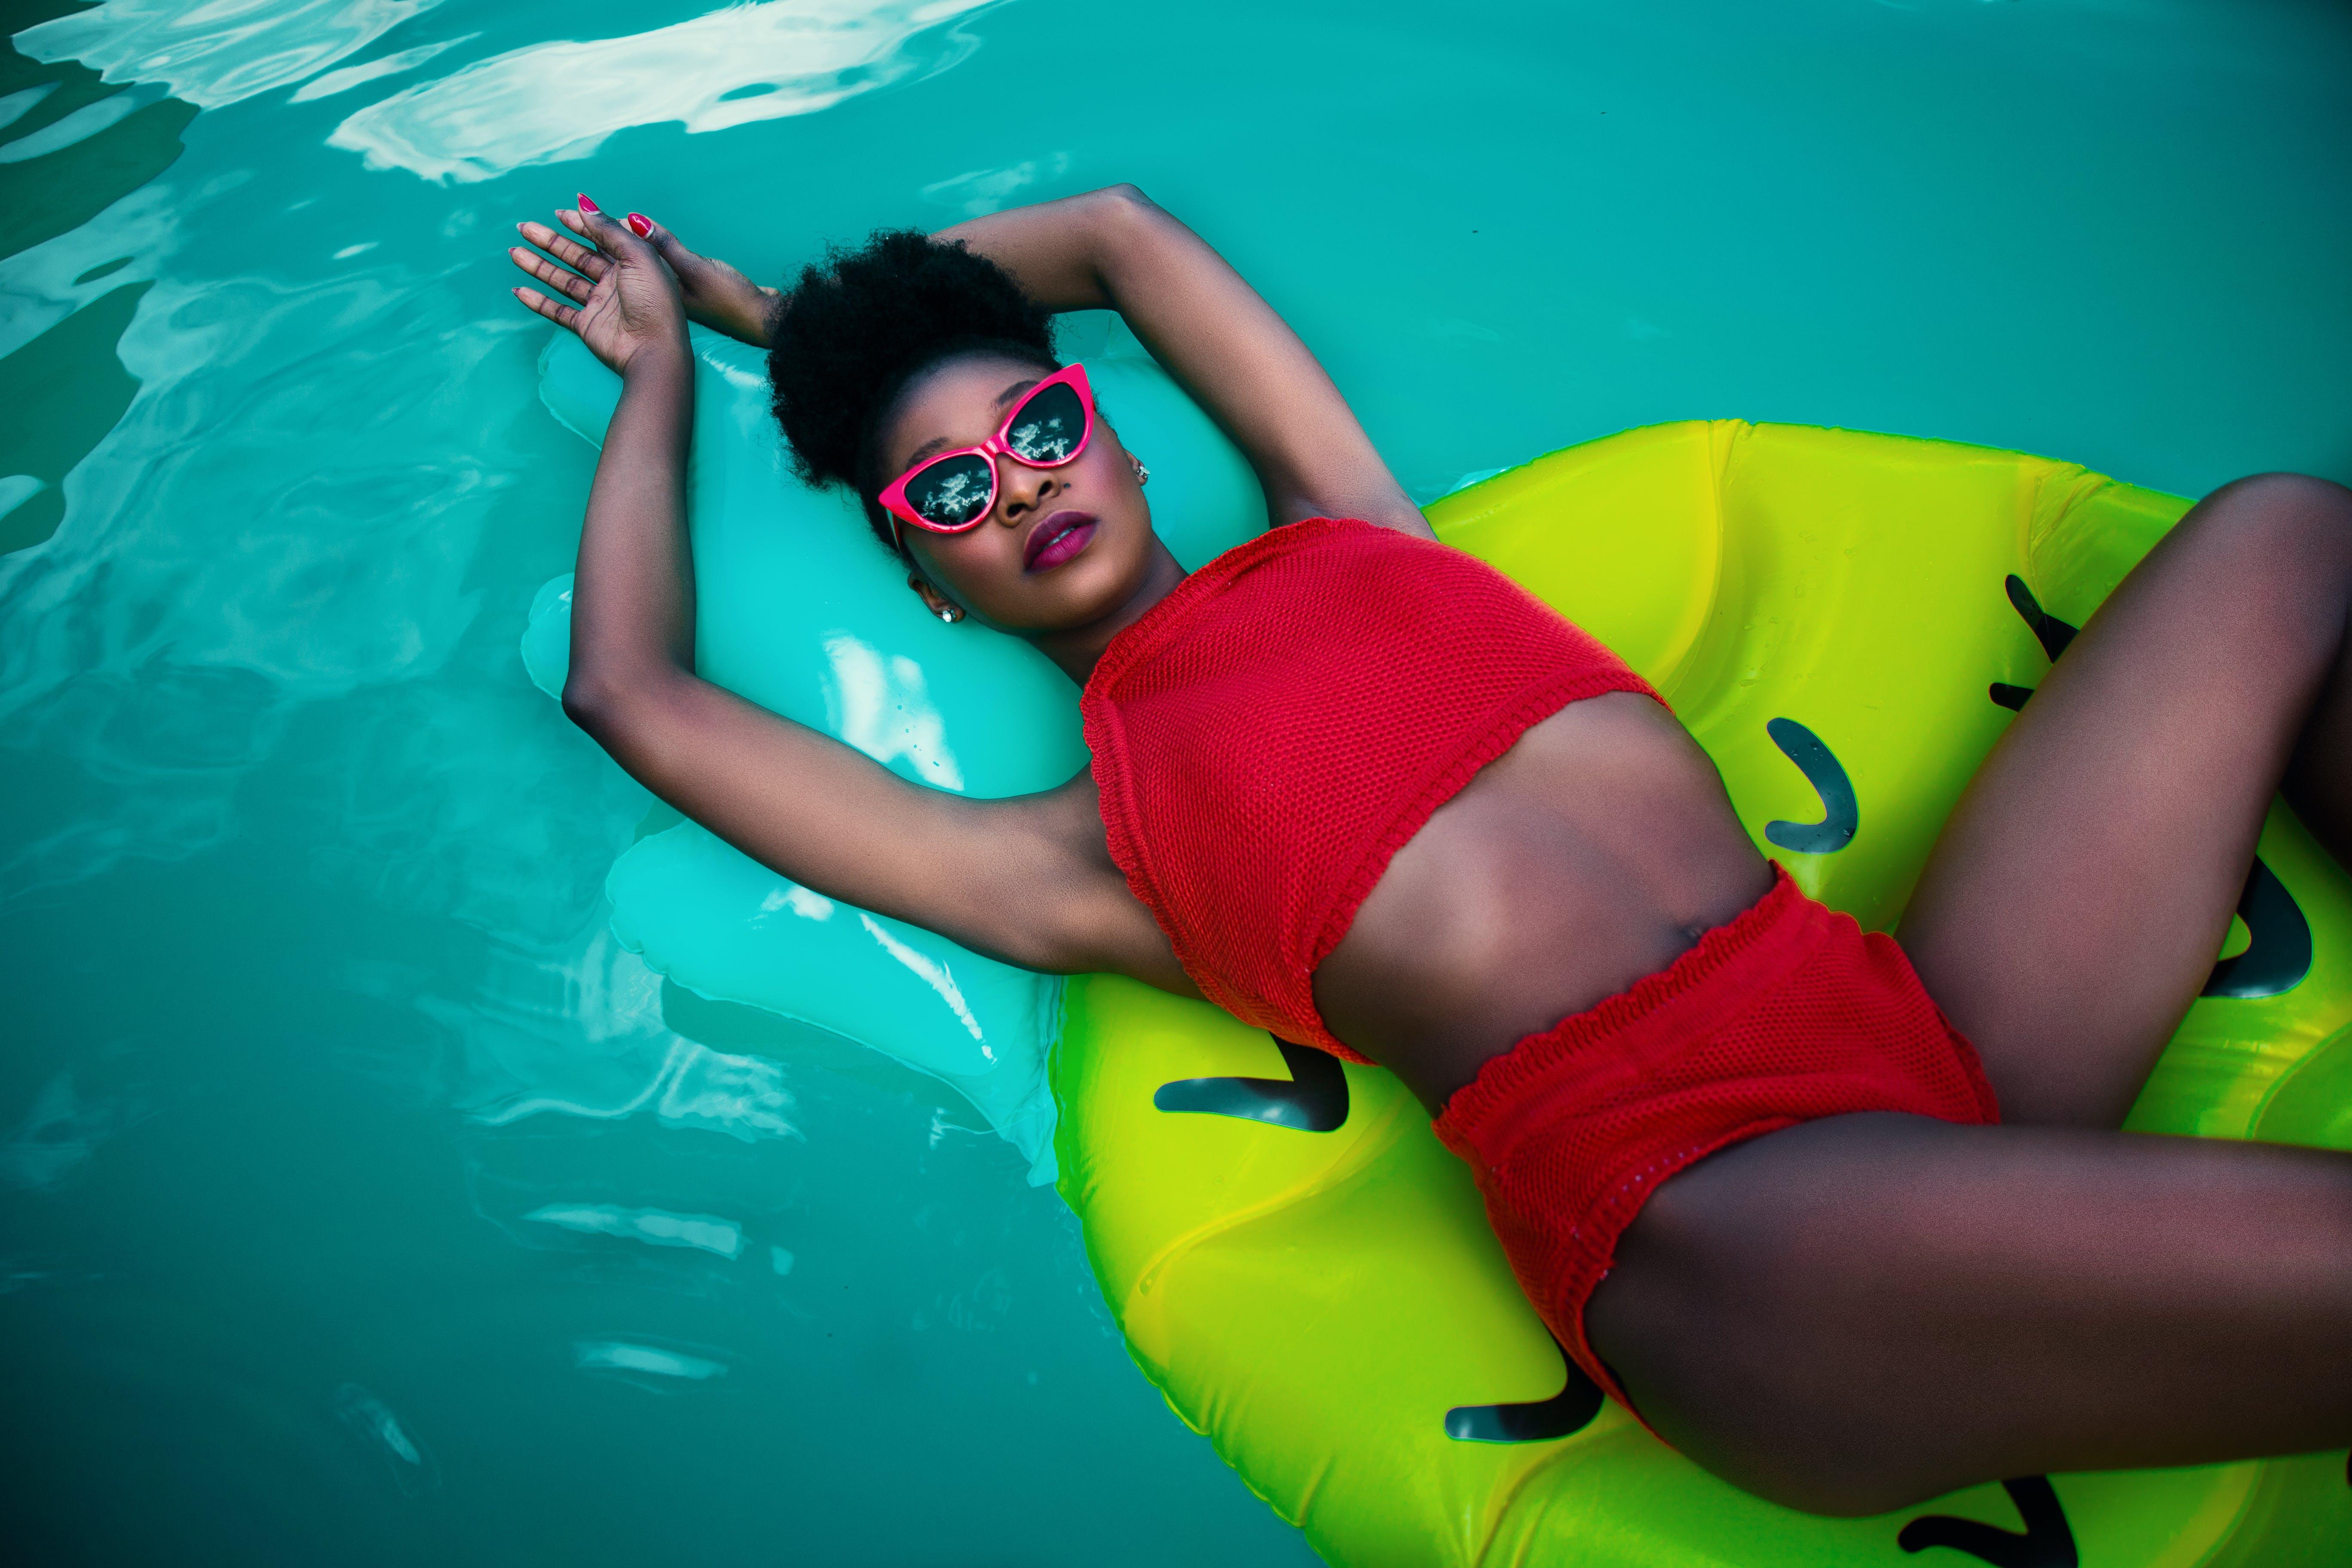 Women's Red Sleeveless Top Bikini